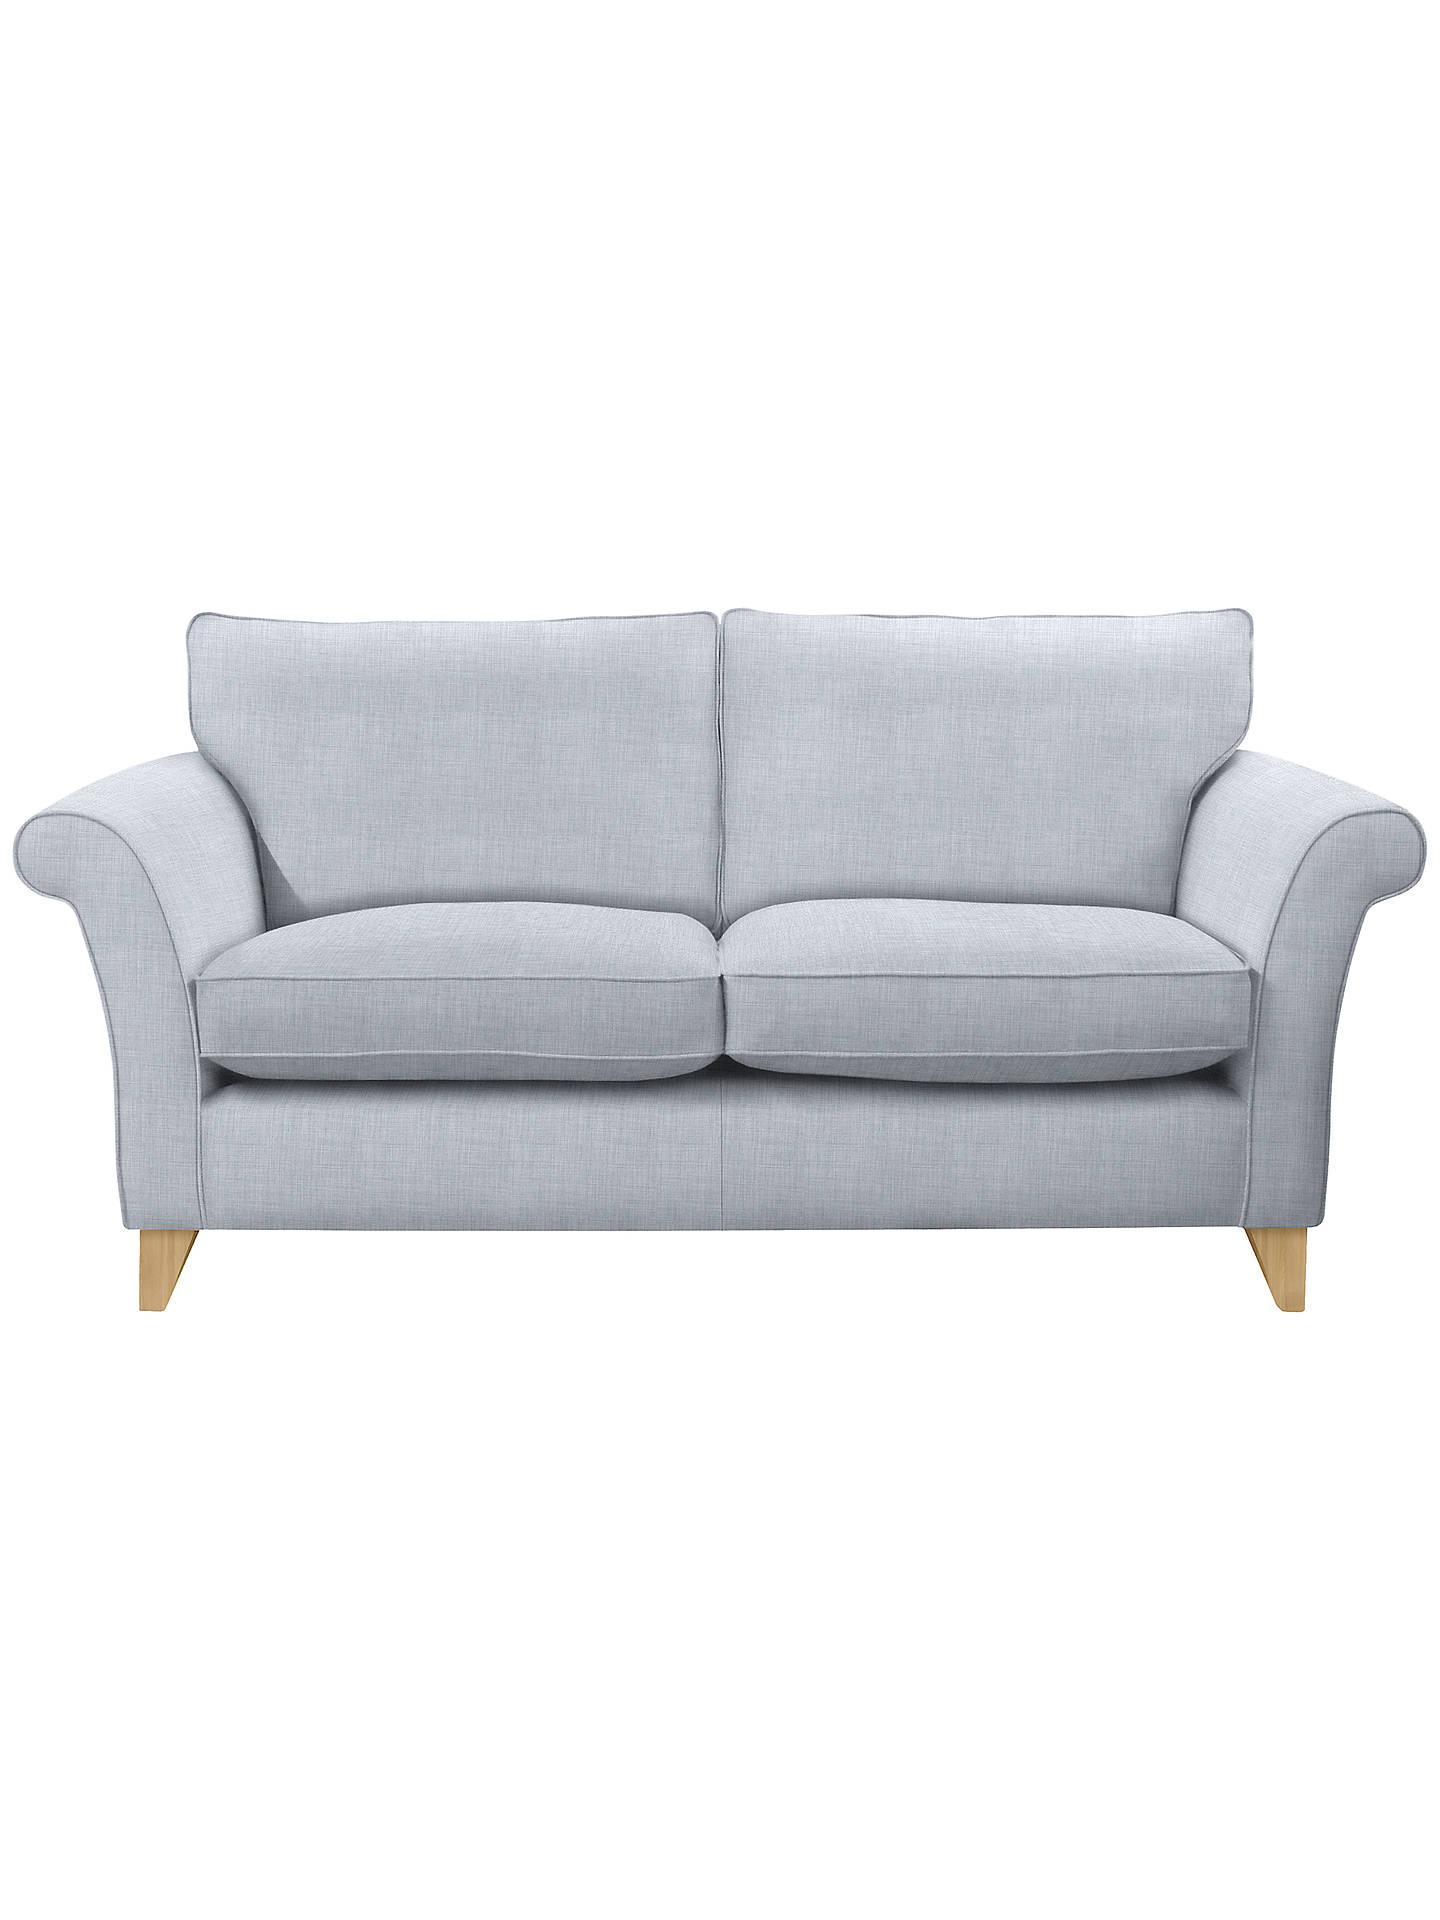 Charlotte Large 3 Seater Sofa Light